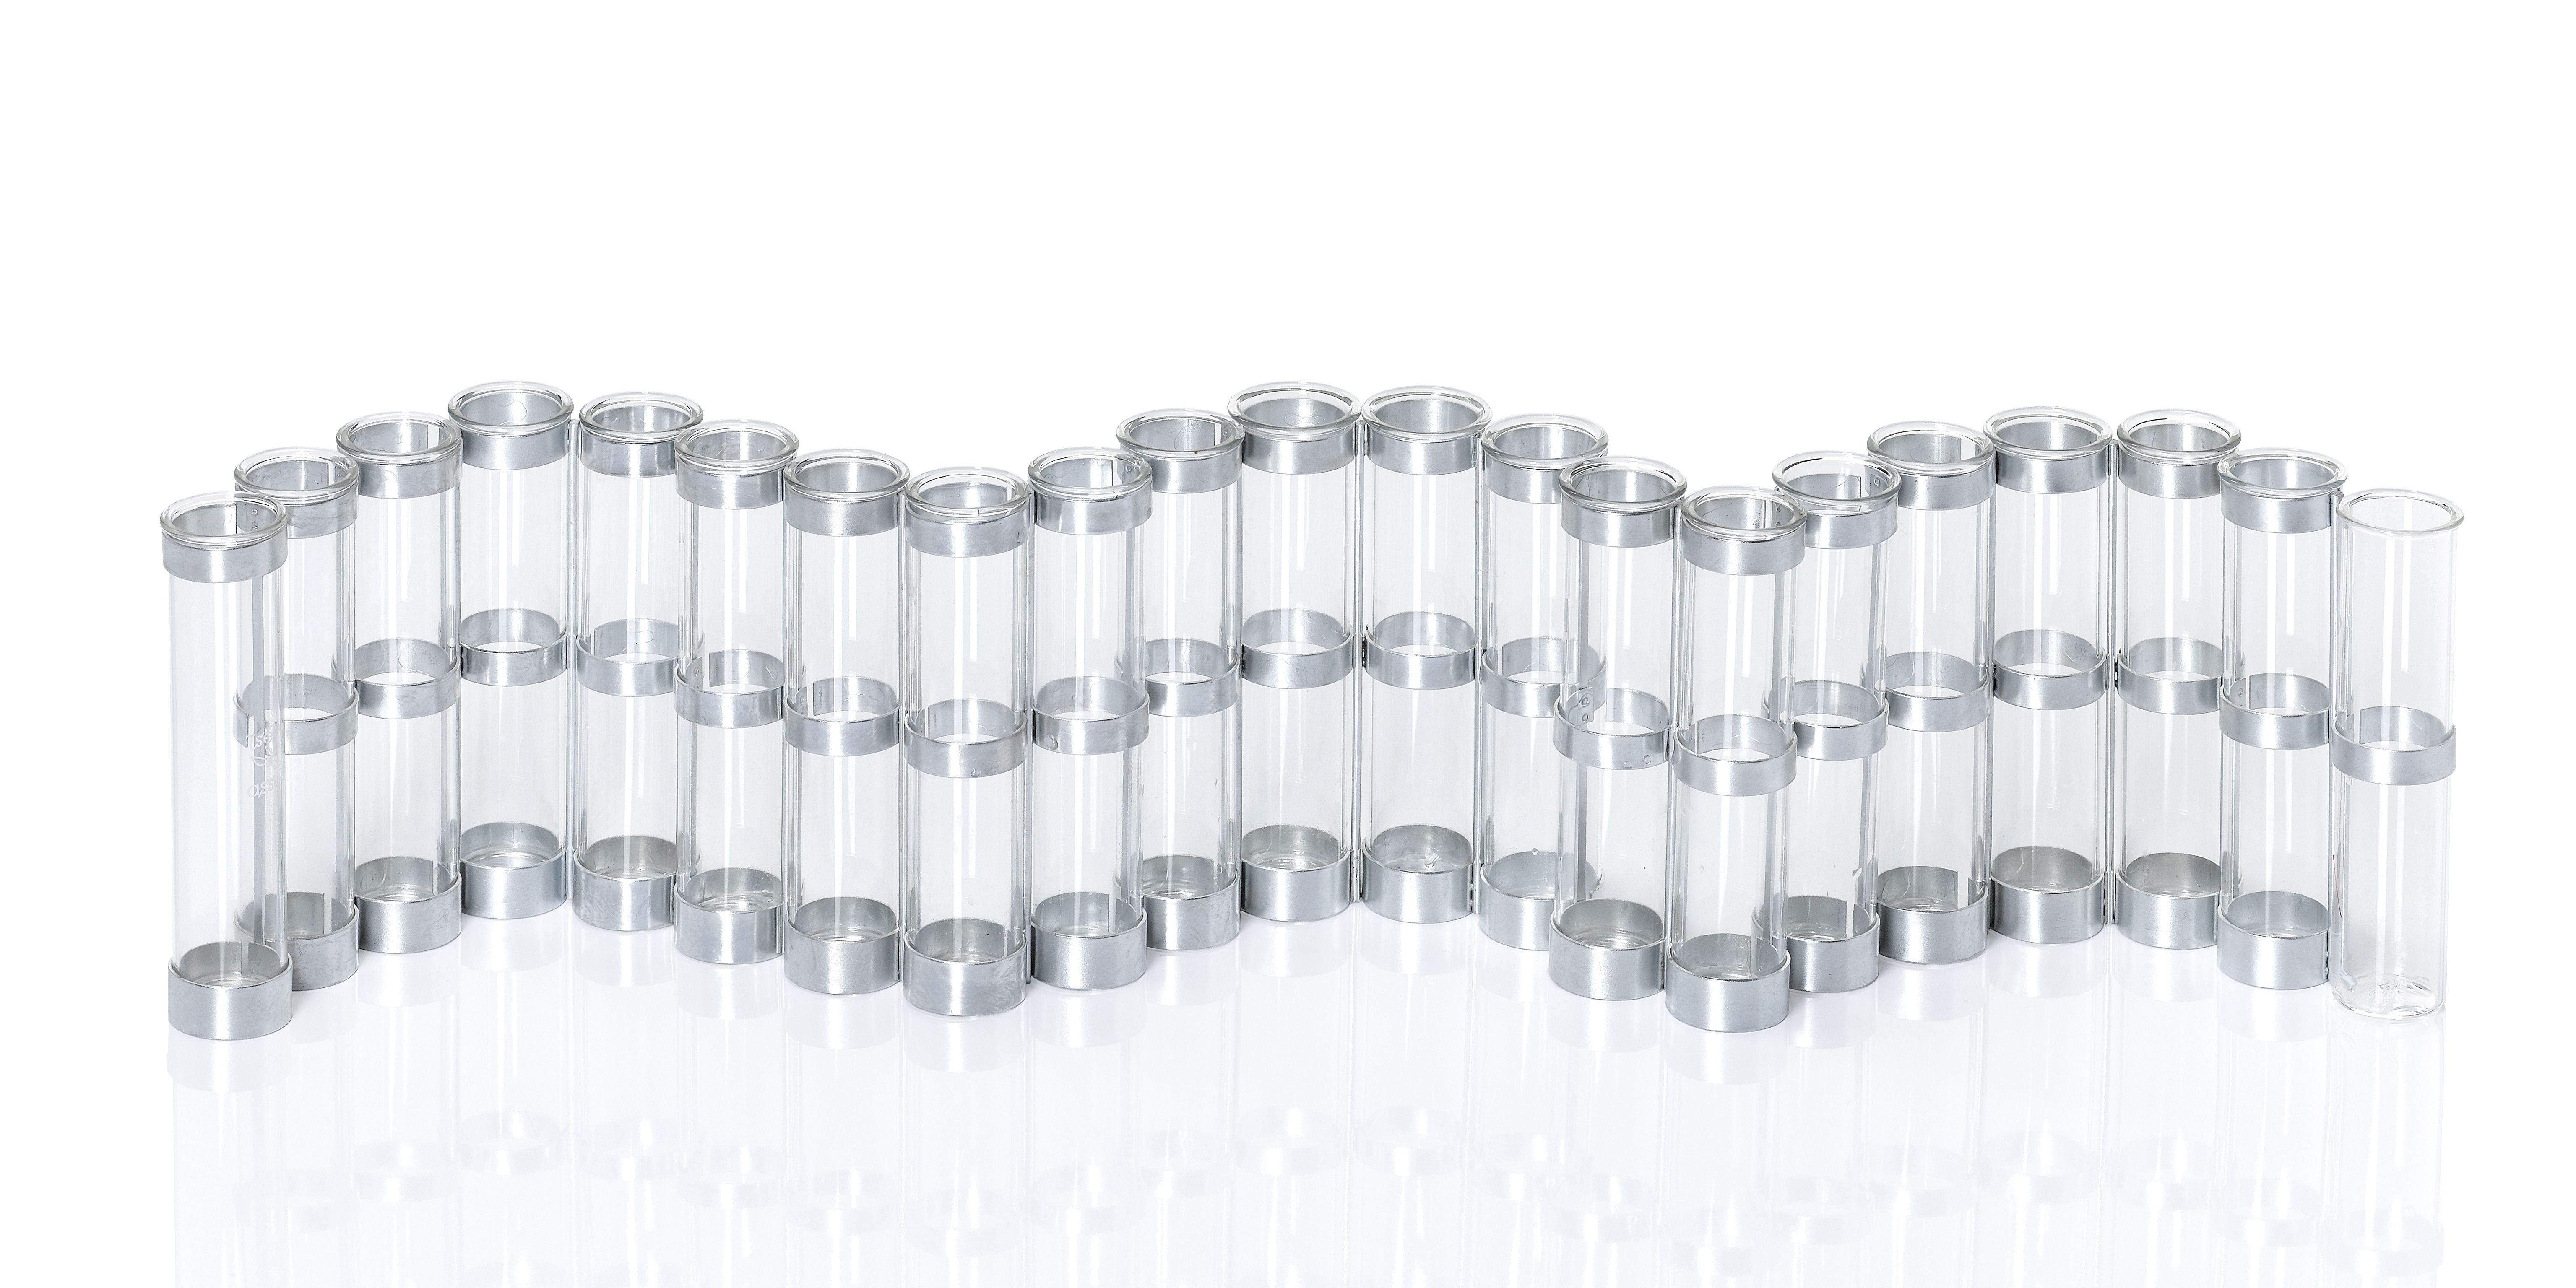 d\'avril Vase - Medium / L 74 x H 15 cm Medium - L 74 x H 15 cm by ...